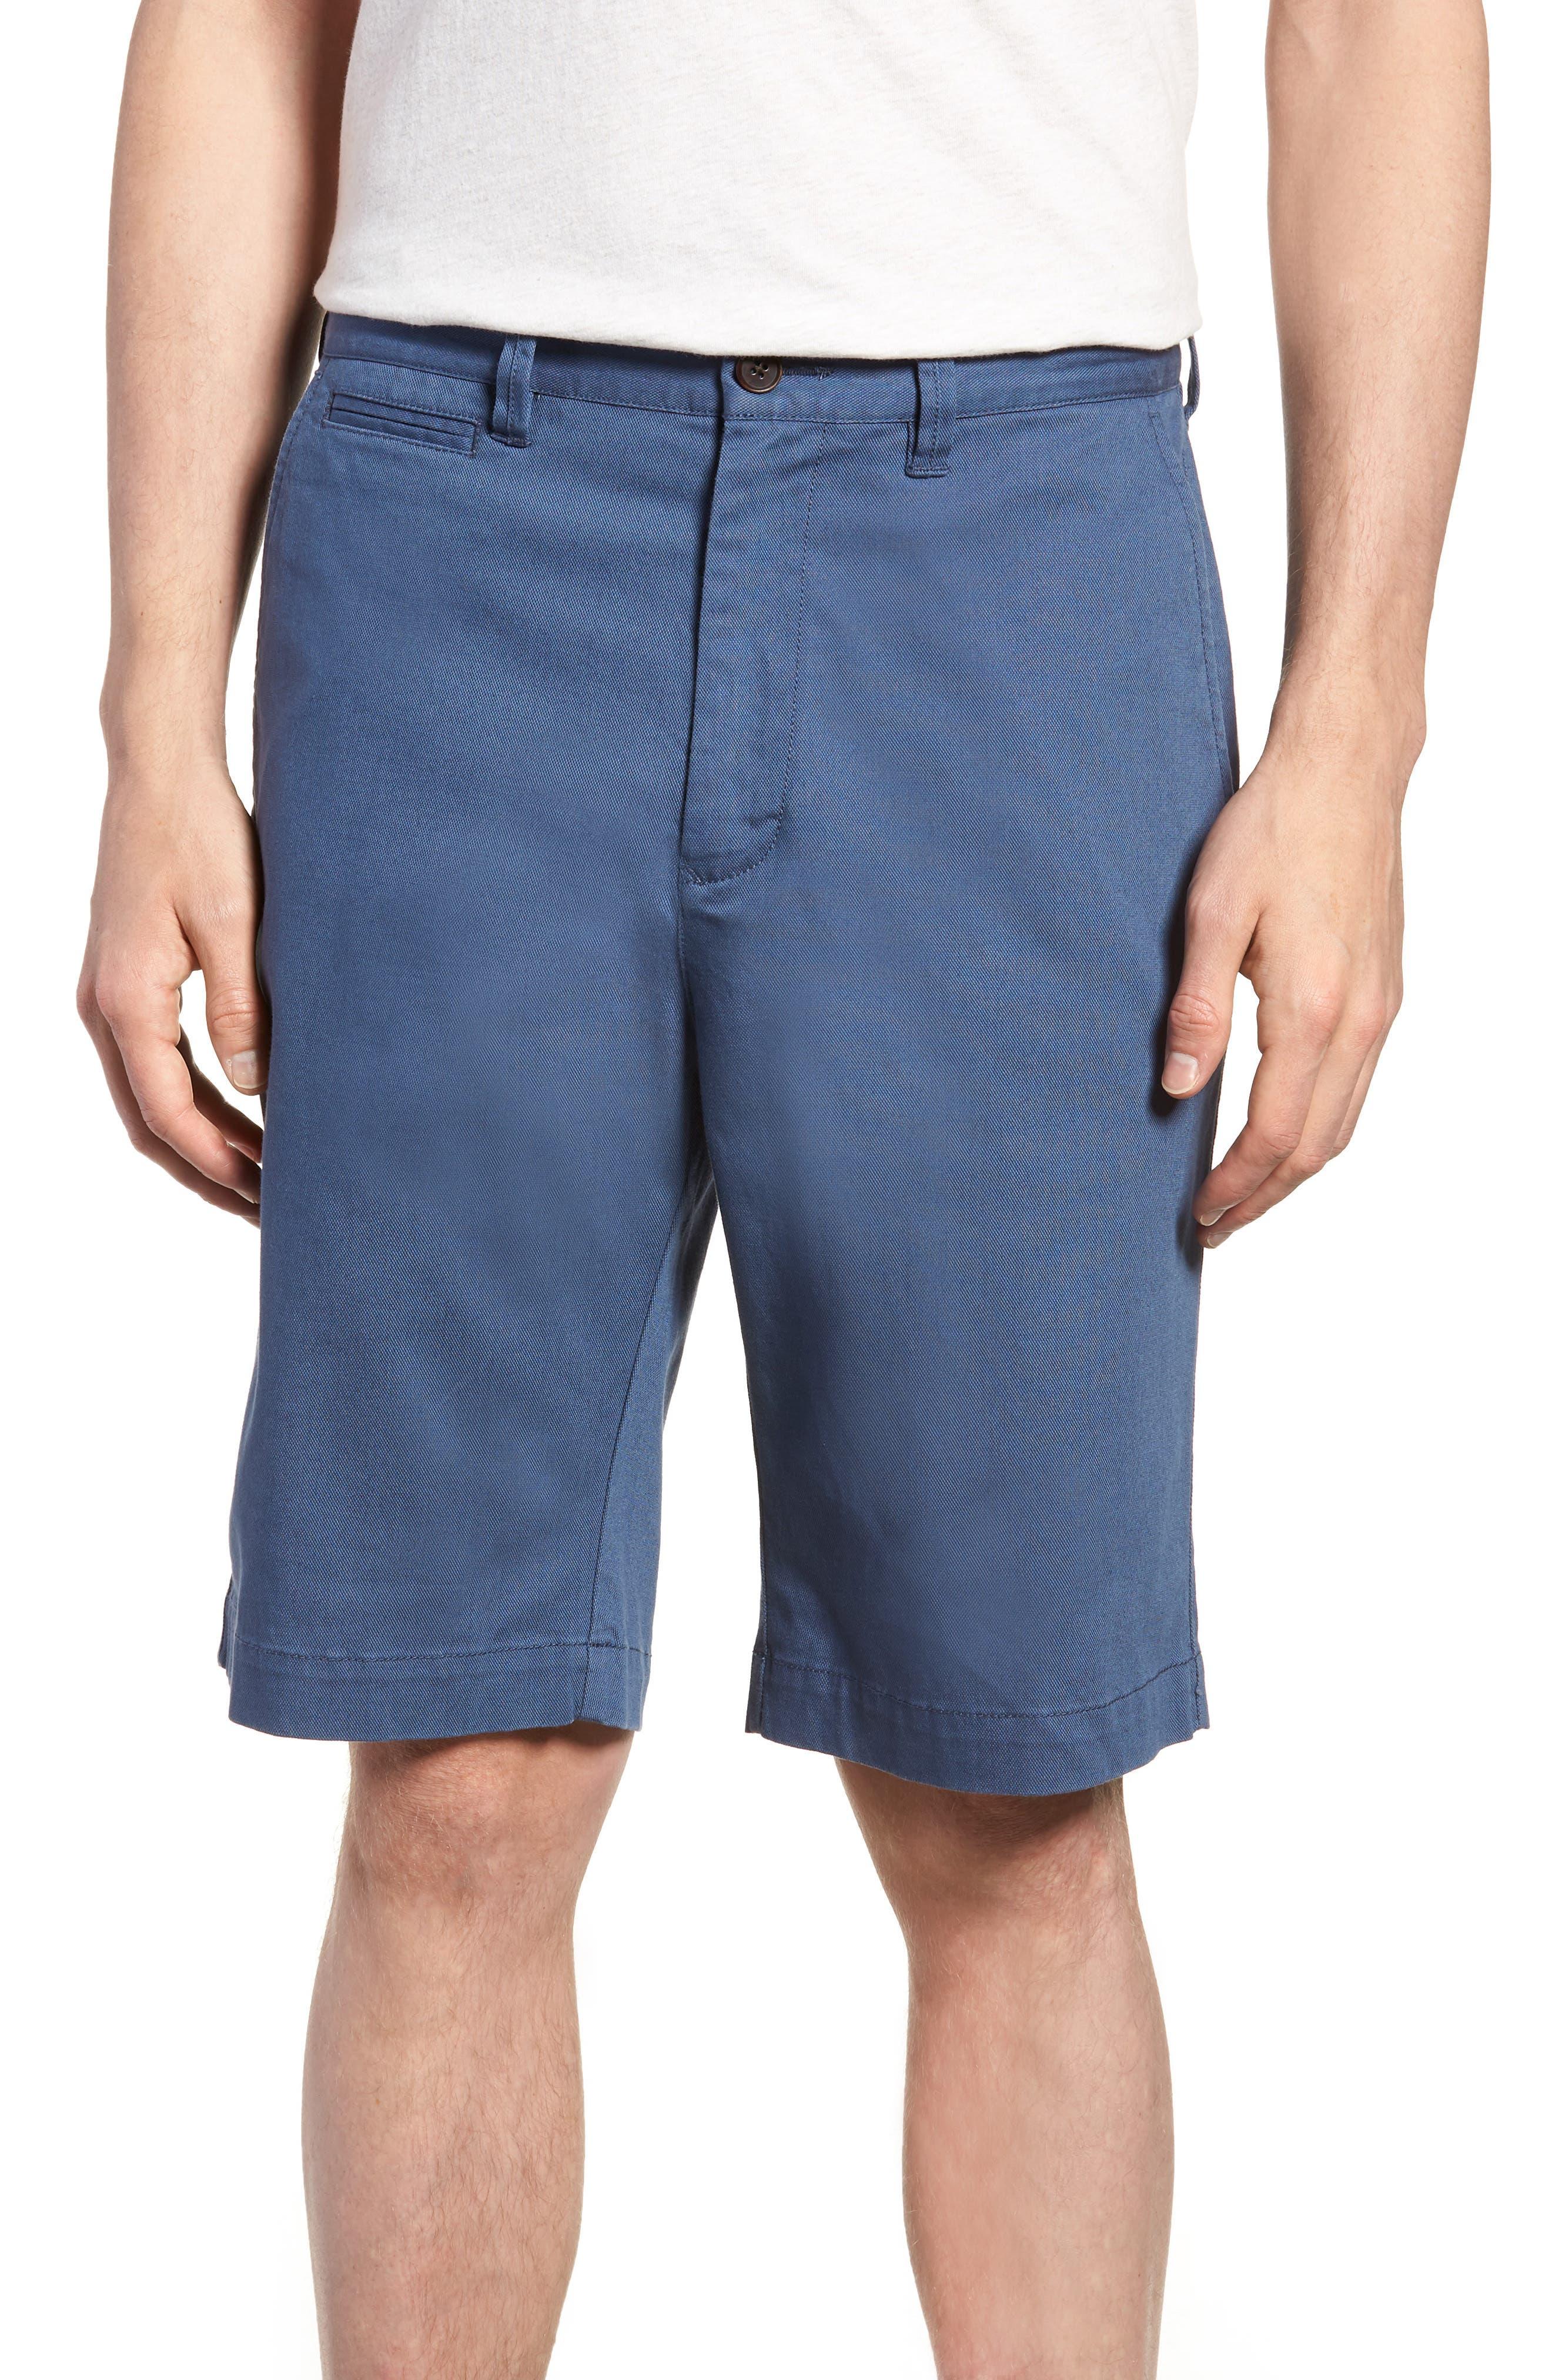 Driving Creek Regular Fit Flat Front Shorts,                             Main thumbnail 1, color,                             Dusk